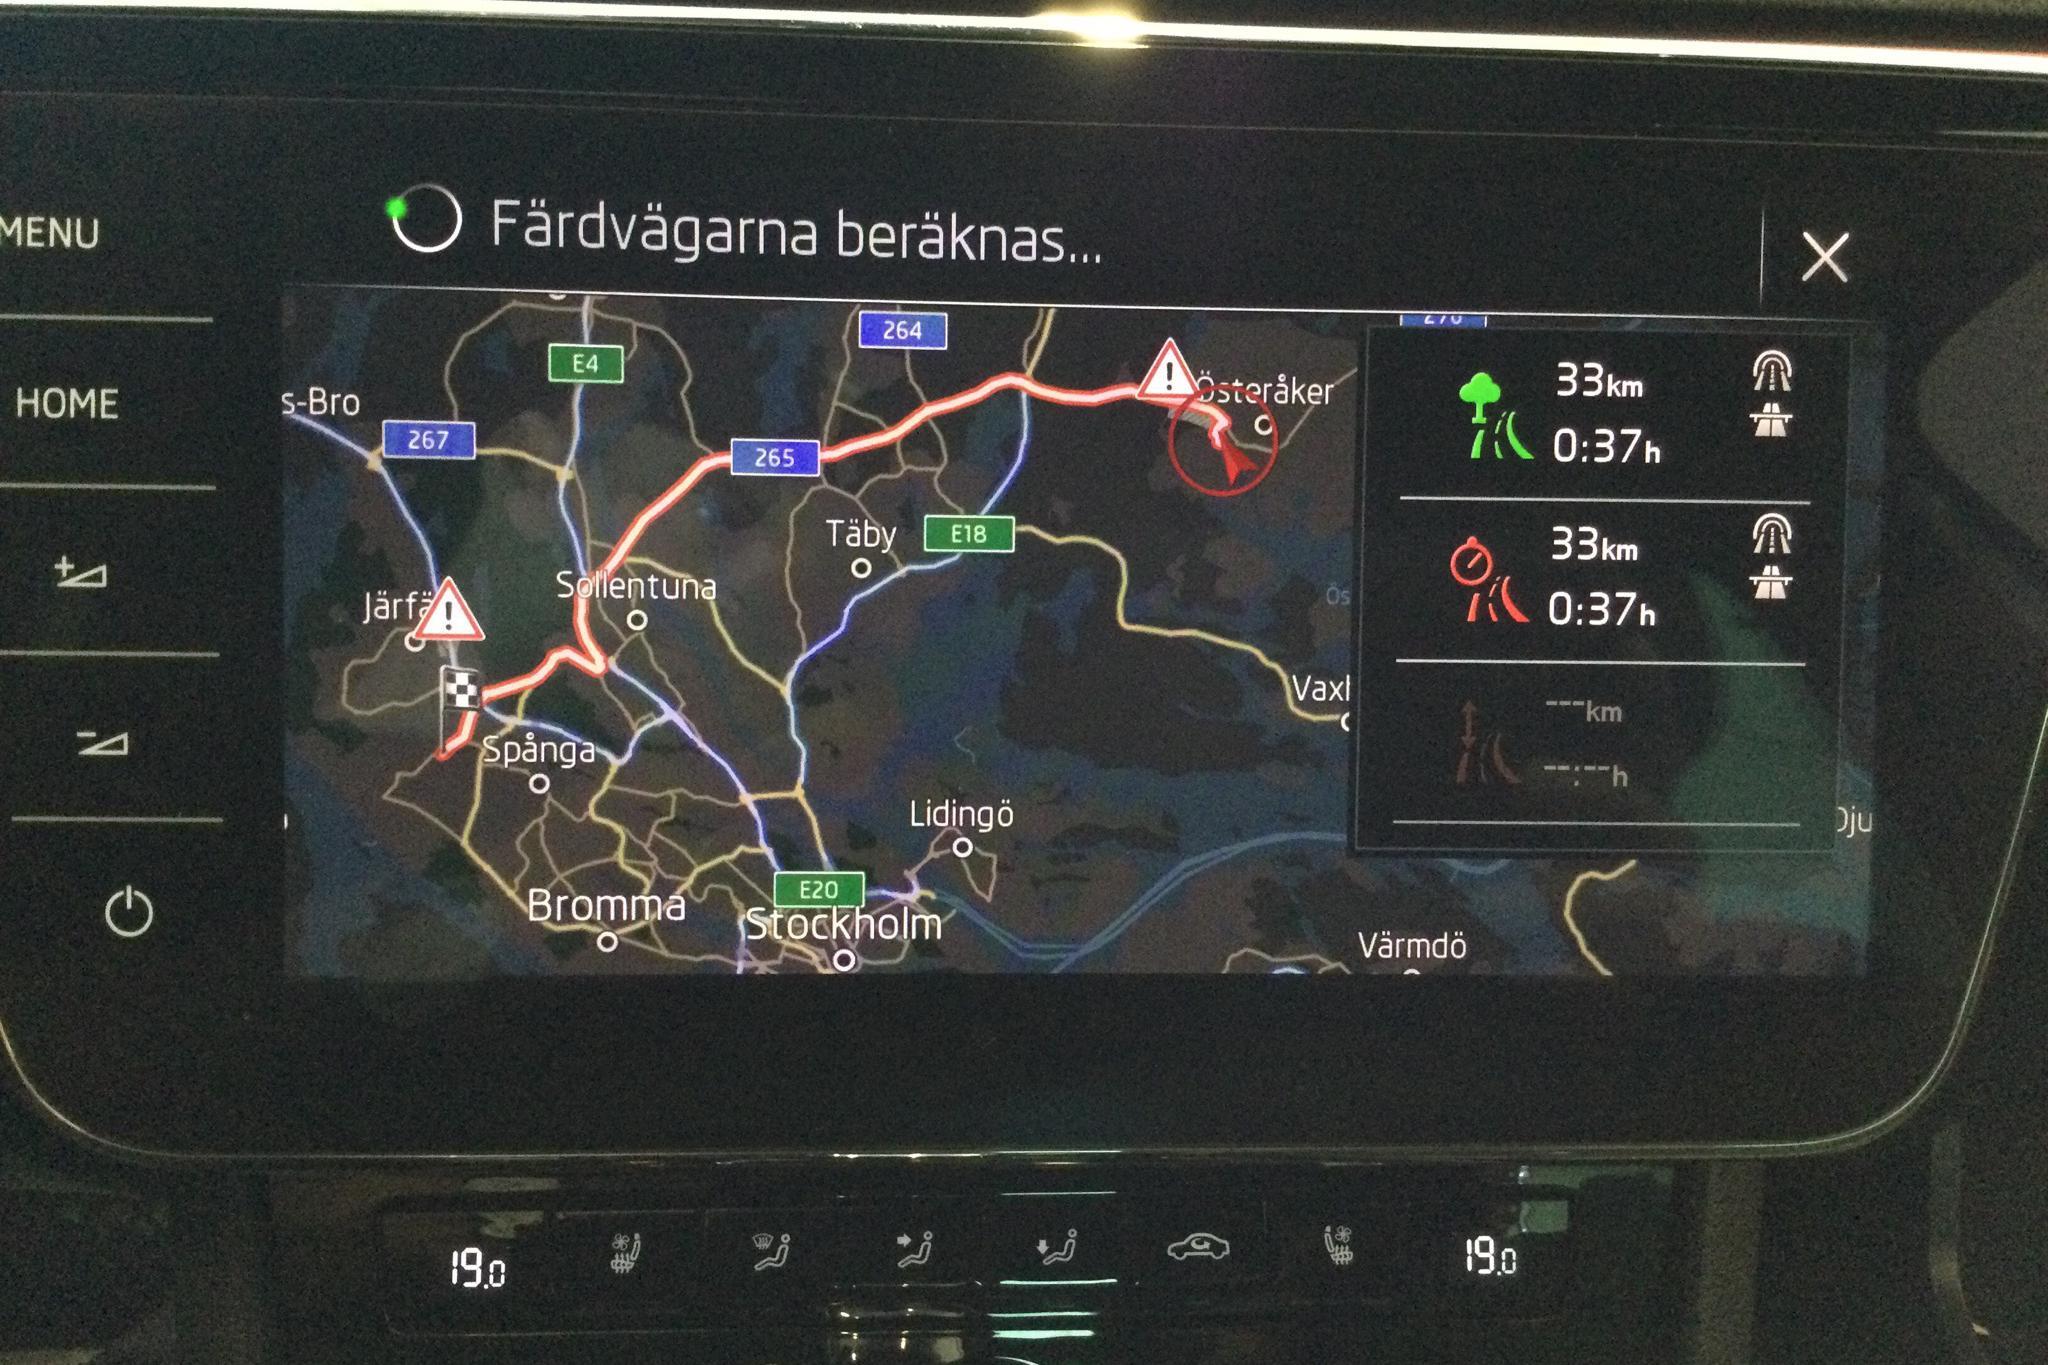 Skoda Superb 2.0 TDI 4x4 Kombi (190hk) - 62 460 km - Automatic - white - 2019